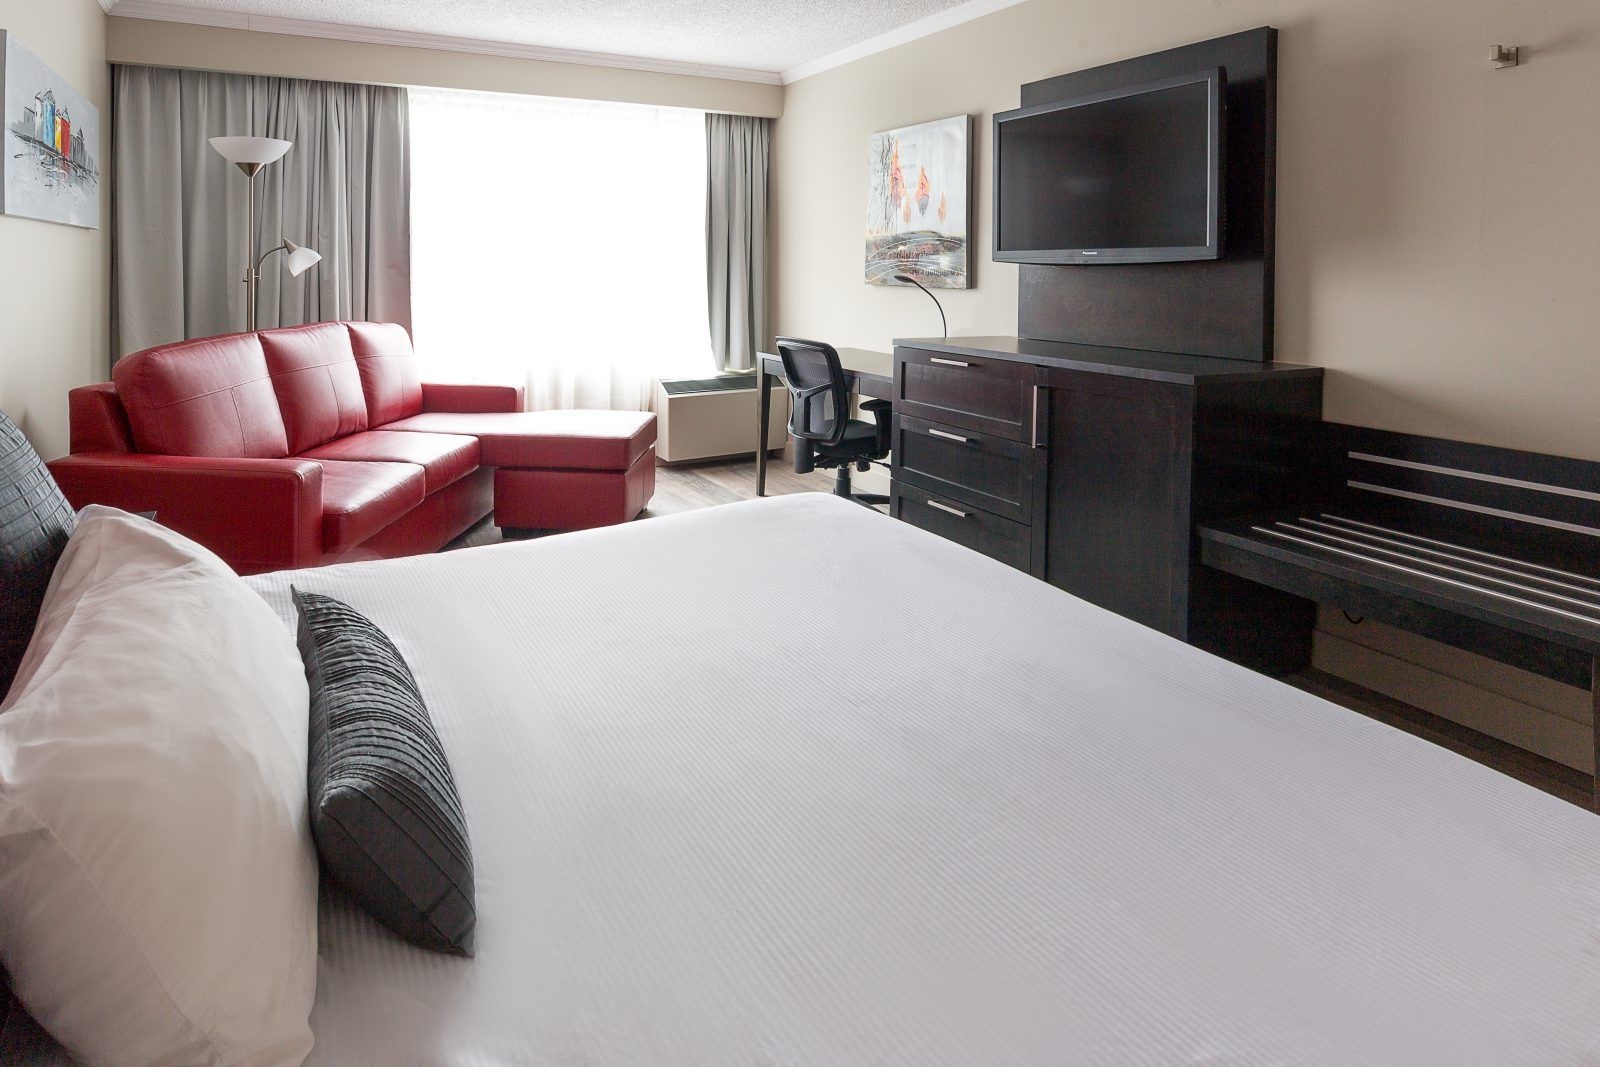 https://www.hoteluniversel.com/wp-content/uploads/2014/09/2Q7A3362-1600x1067.jpg